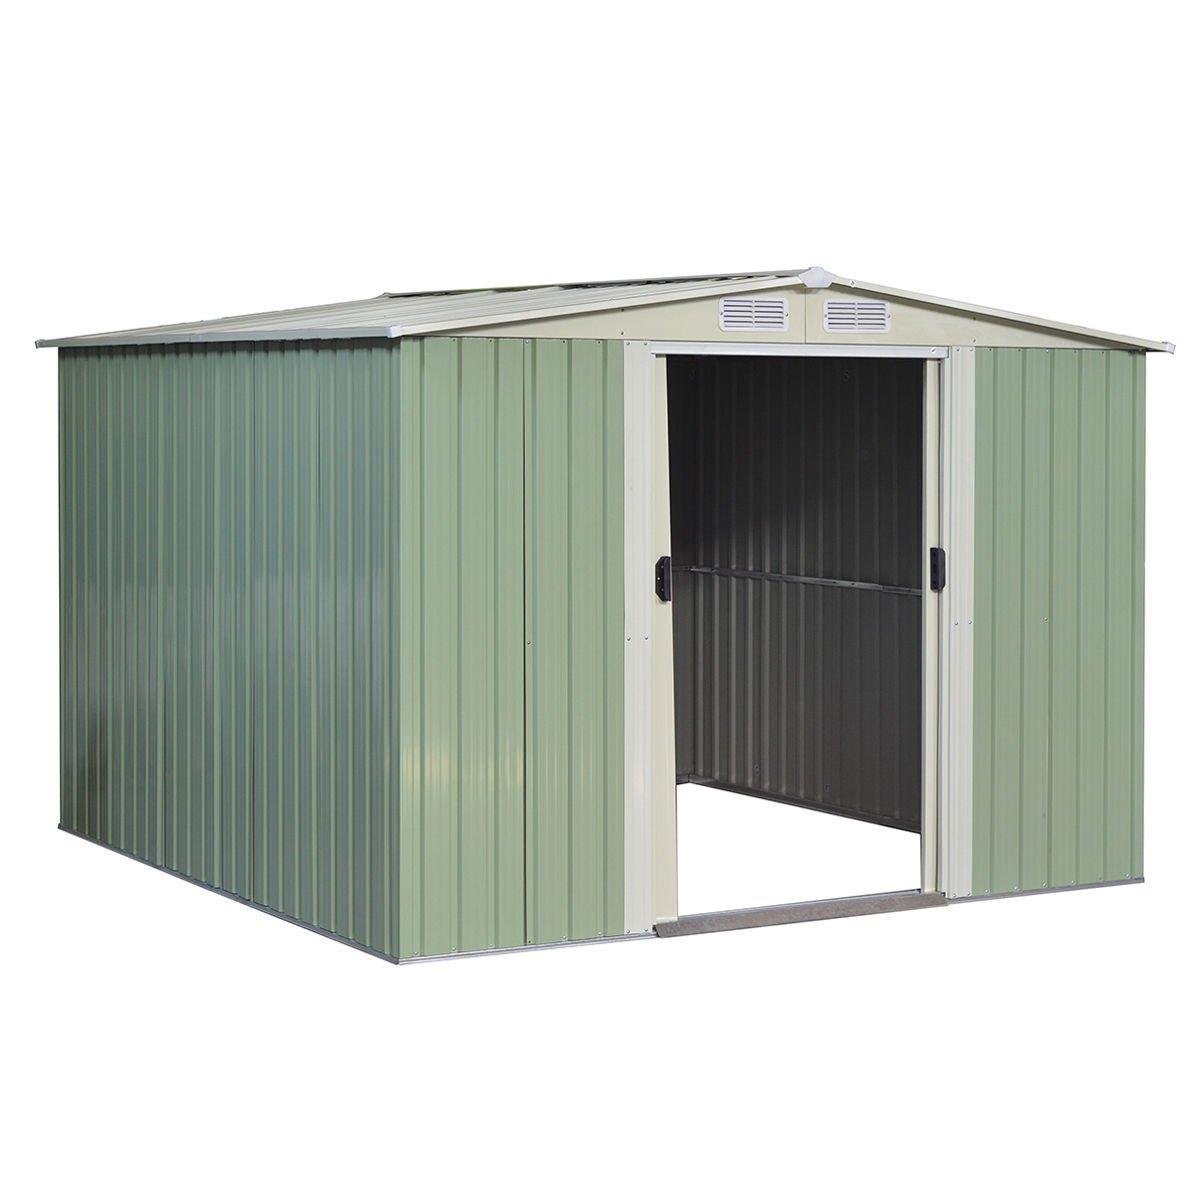 Goplus Galvanized Steel Outdoor Garden Storage Shed 8.5x 8.5Ft Heavy Duty Tool House W/ Sliding Door (Light Green)